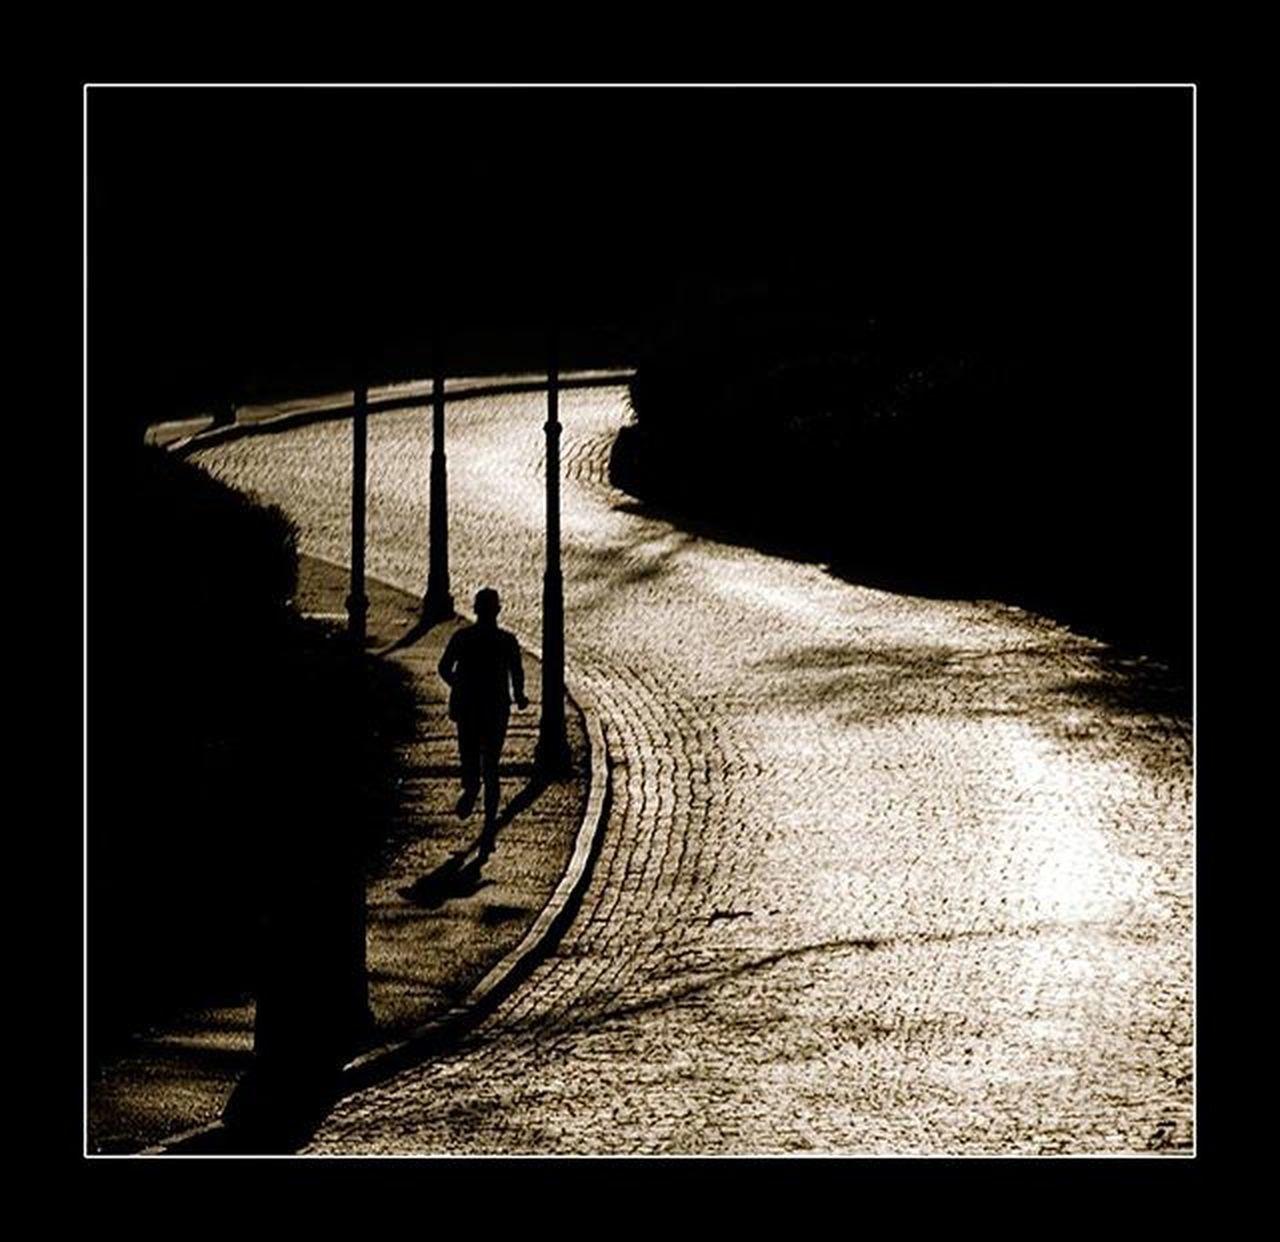 Gold Canon Torino Phototag_it Ig_europe Ig_torino Ig_piemonte Parcovalentino Monochrome Gold Volgopiemonte Running